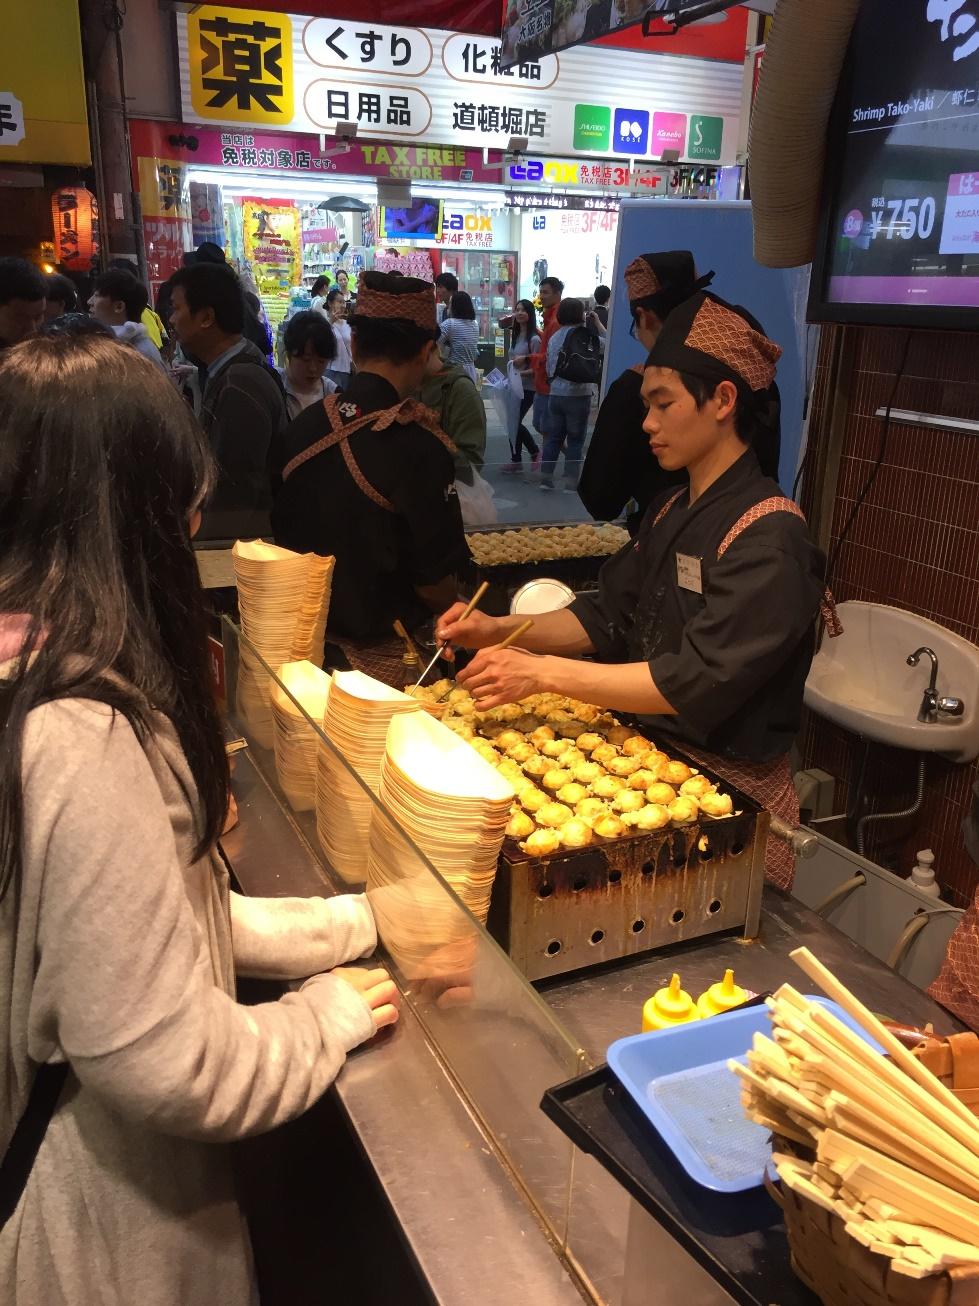 cibo Giapponese - Journeydraft - TakoYakipadella